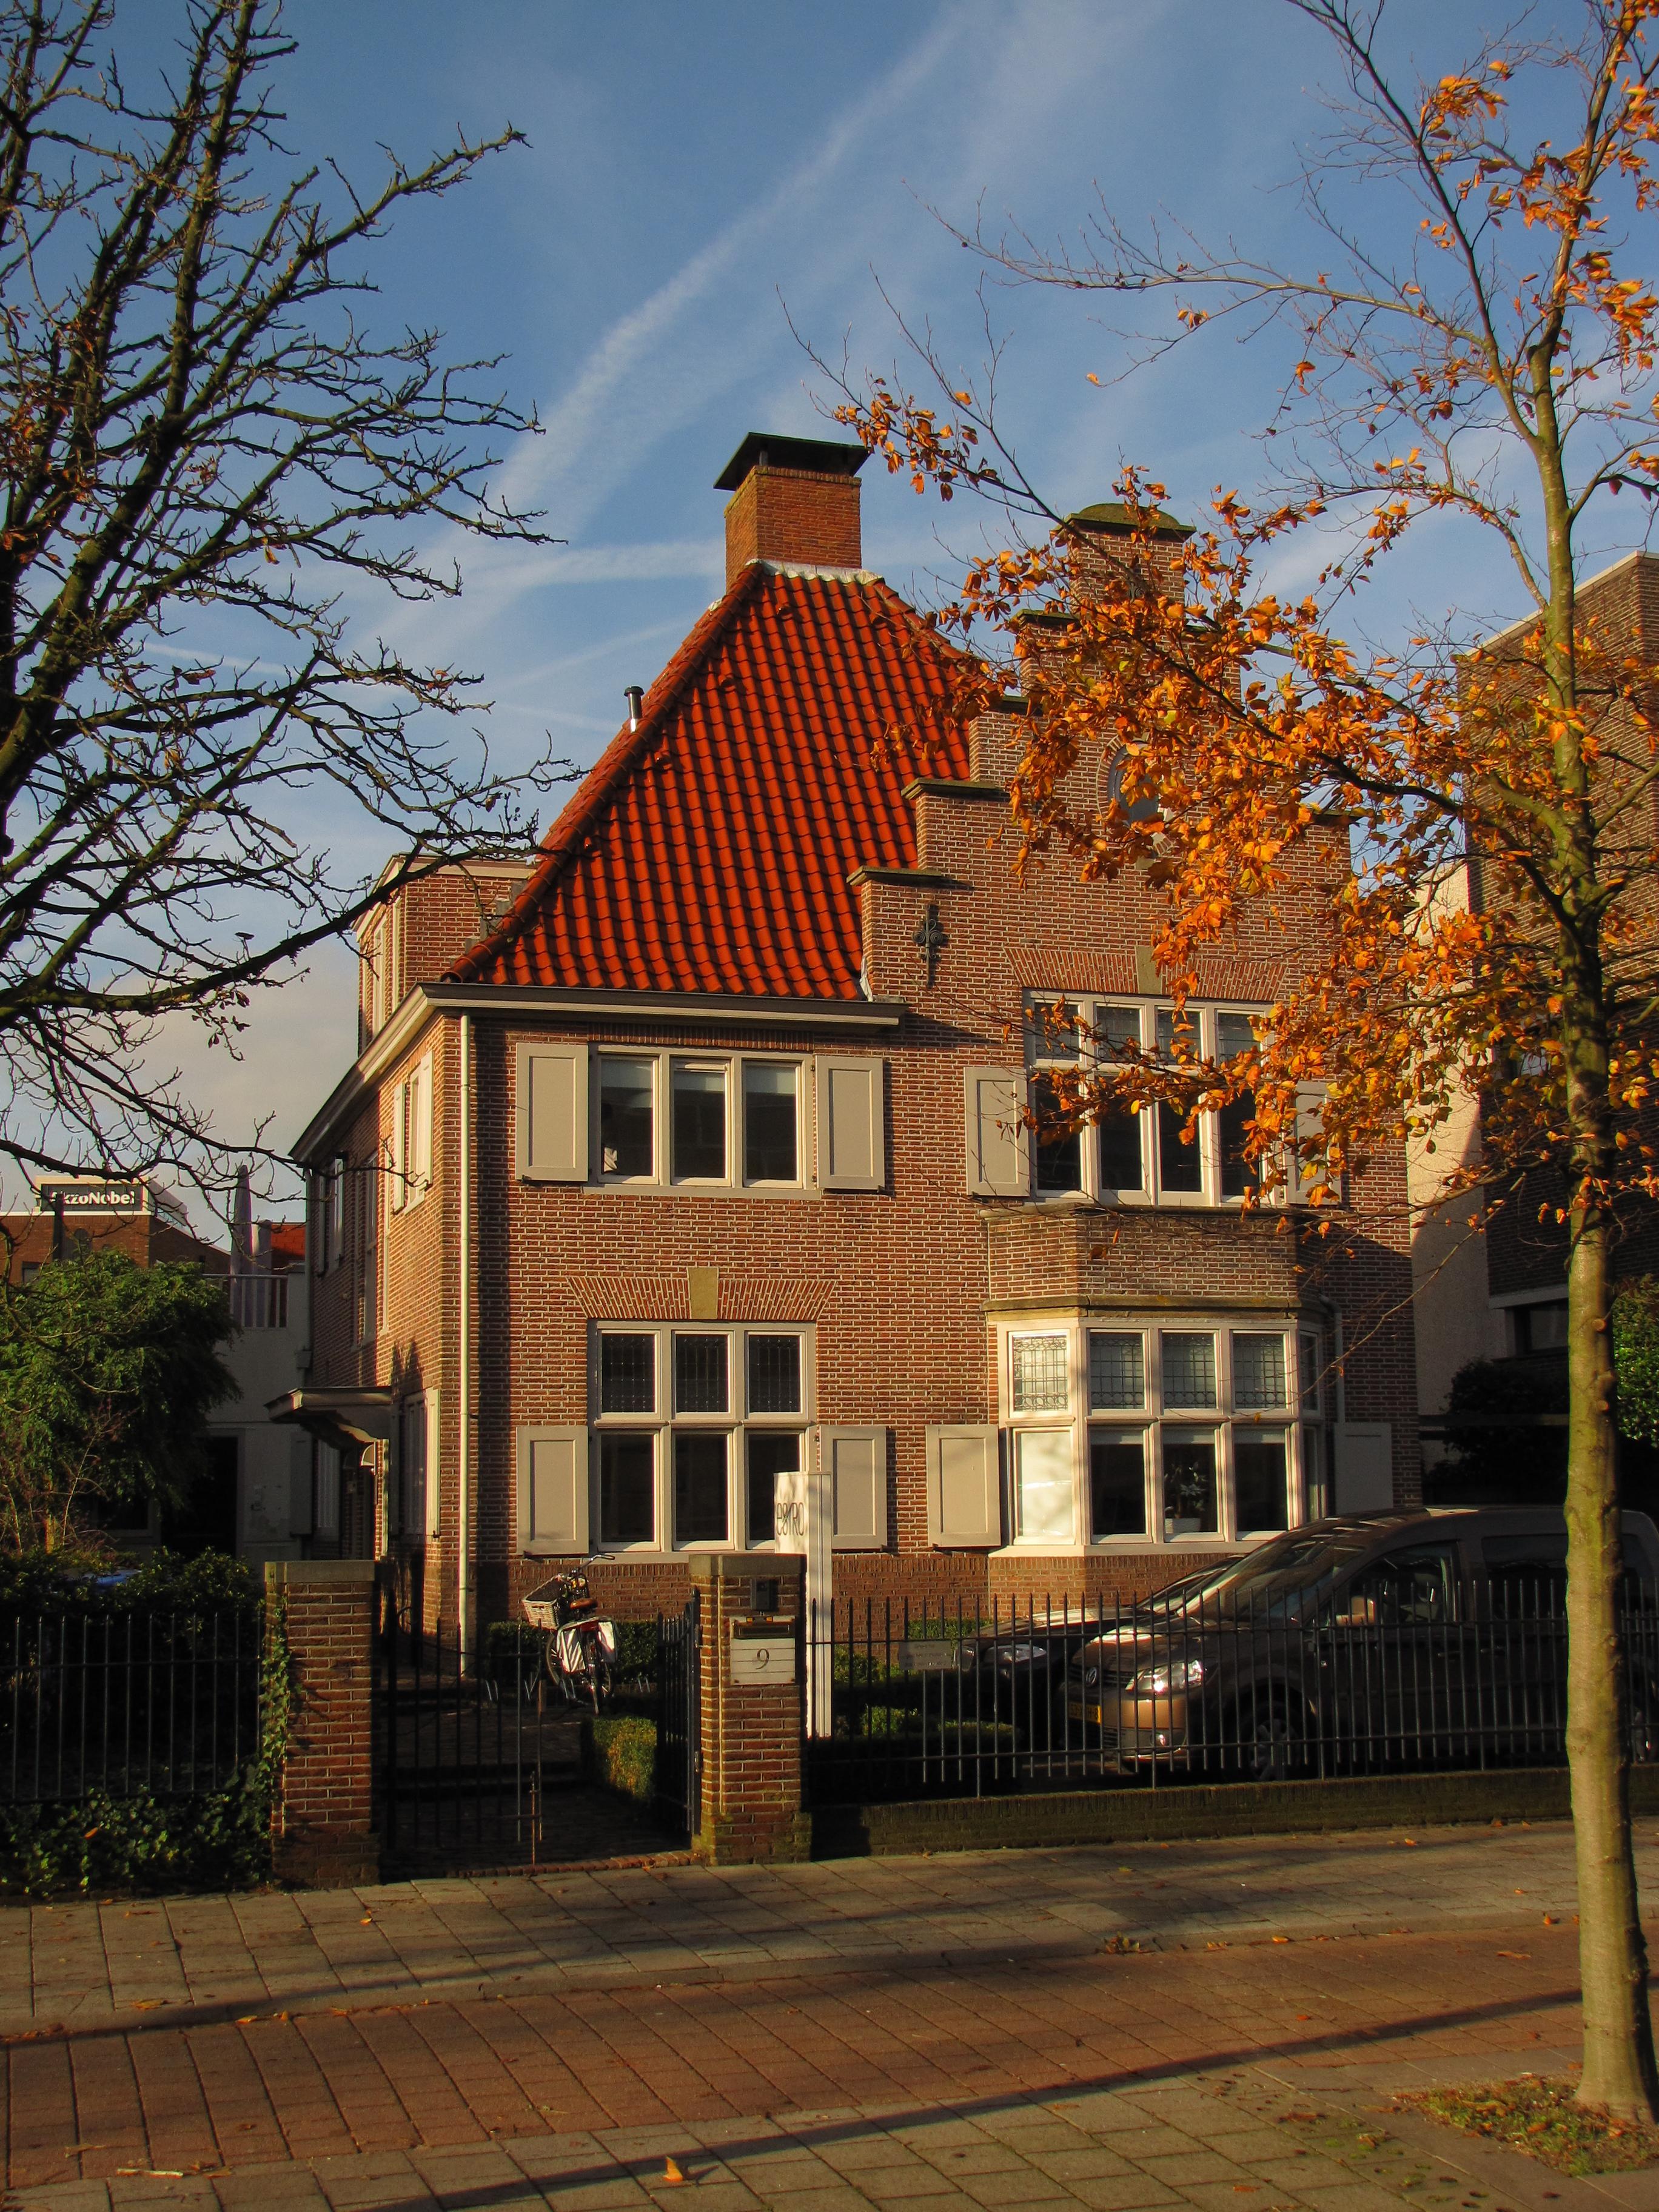 File:Amersfoort, Utrechtseweg 9 GM0307-491.JPG